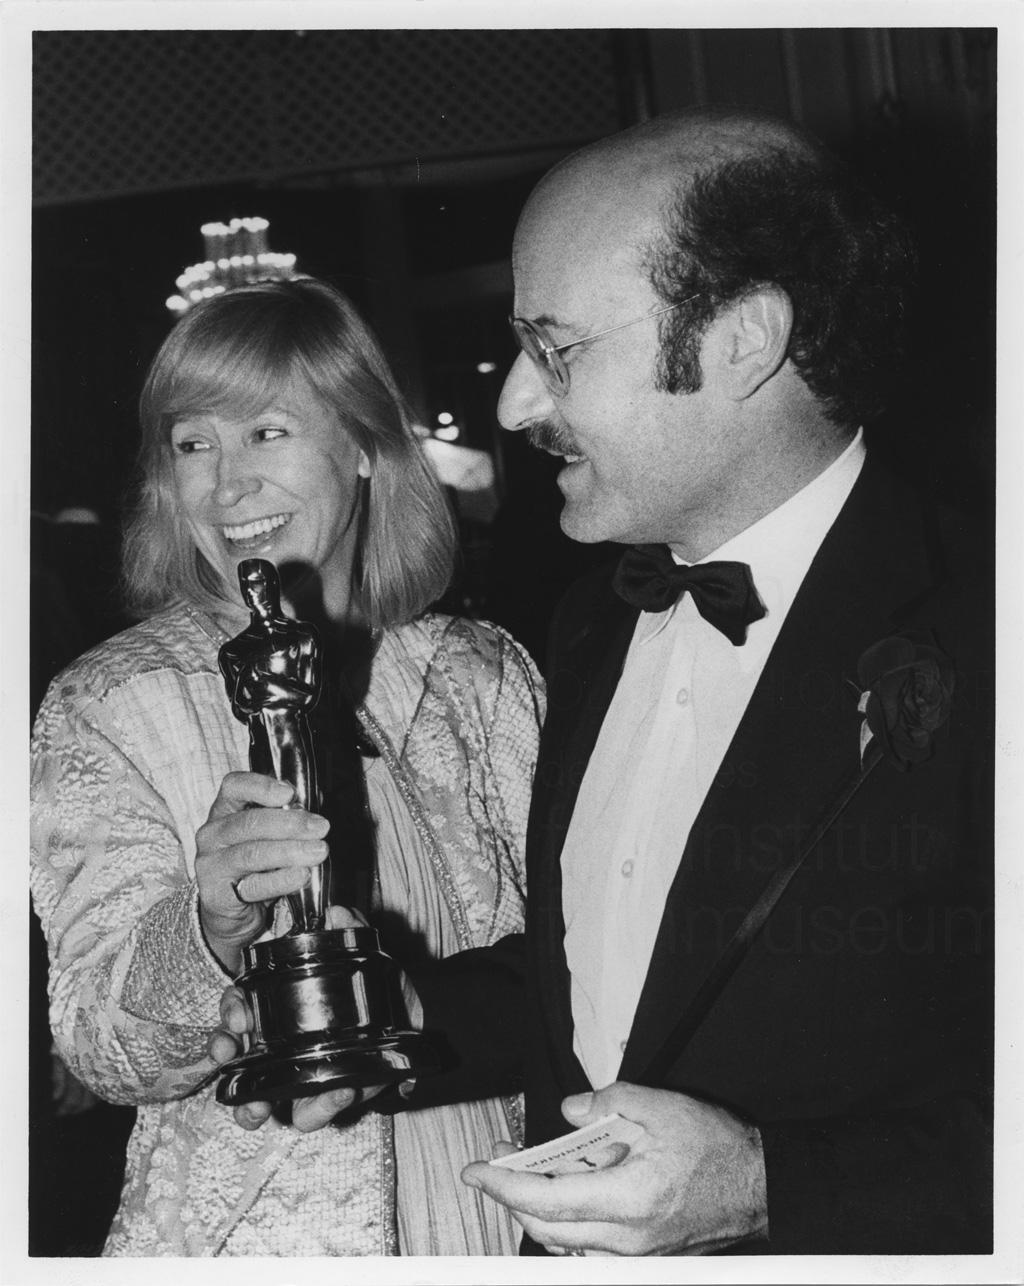 DIE BLECHTROMMEL // Fotos / Academy Awards 1980